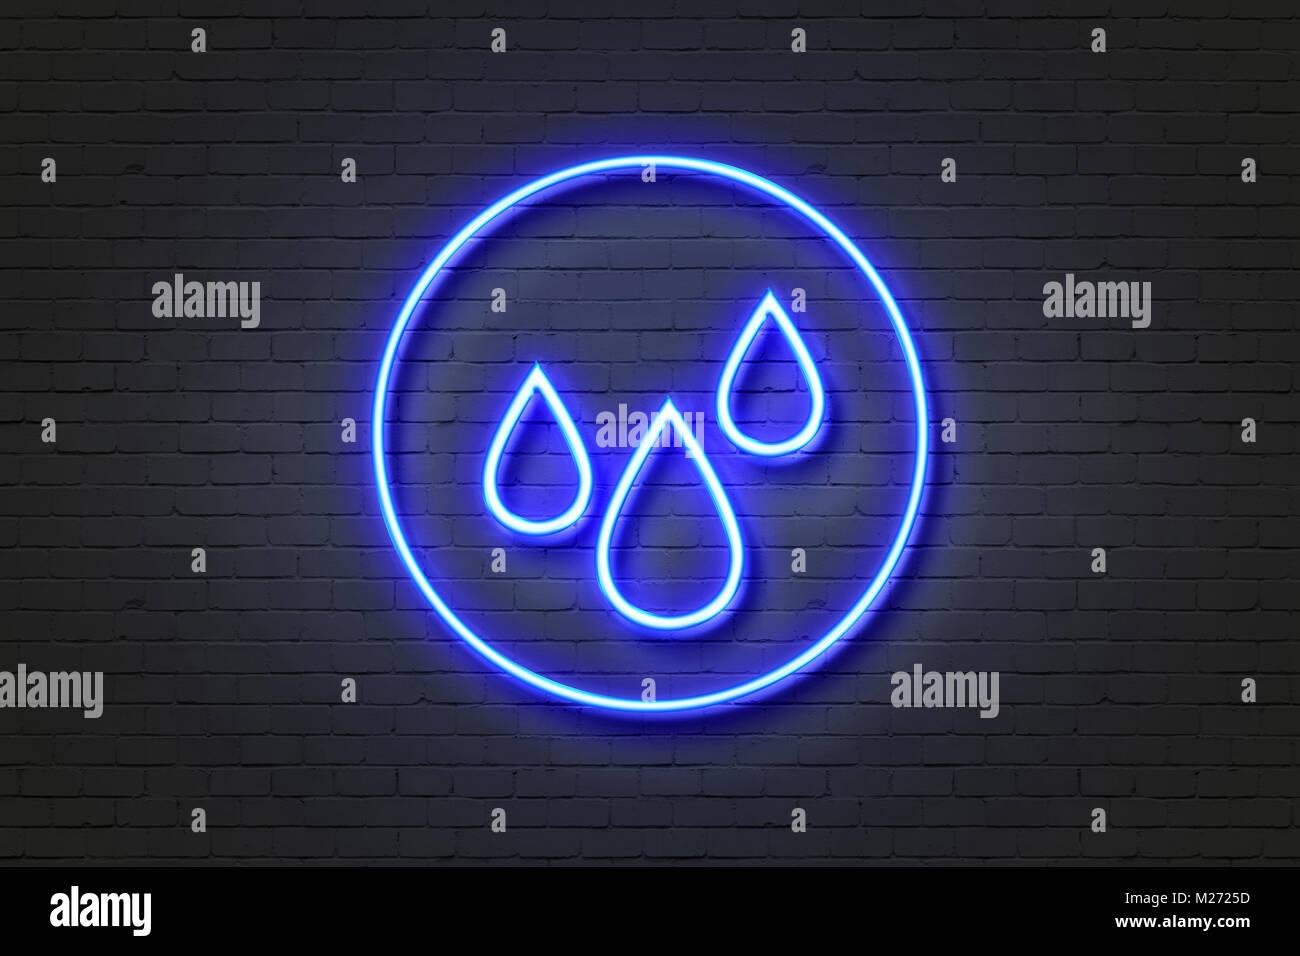 Neon light icon rain - Stock Image